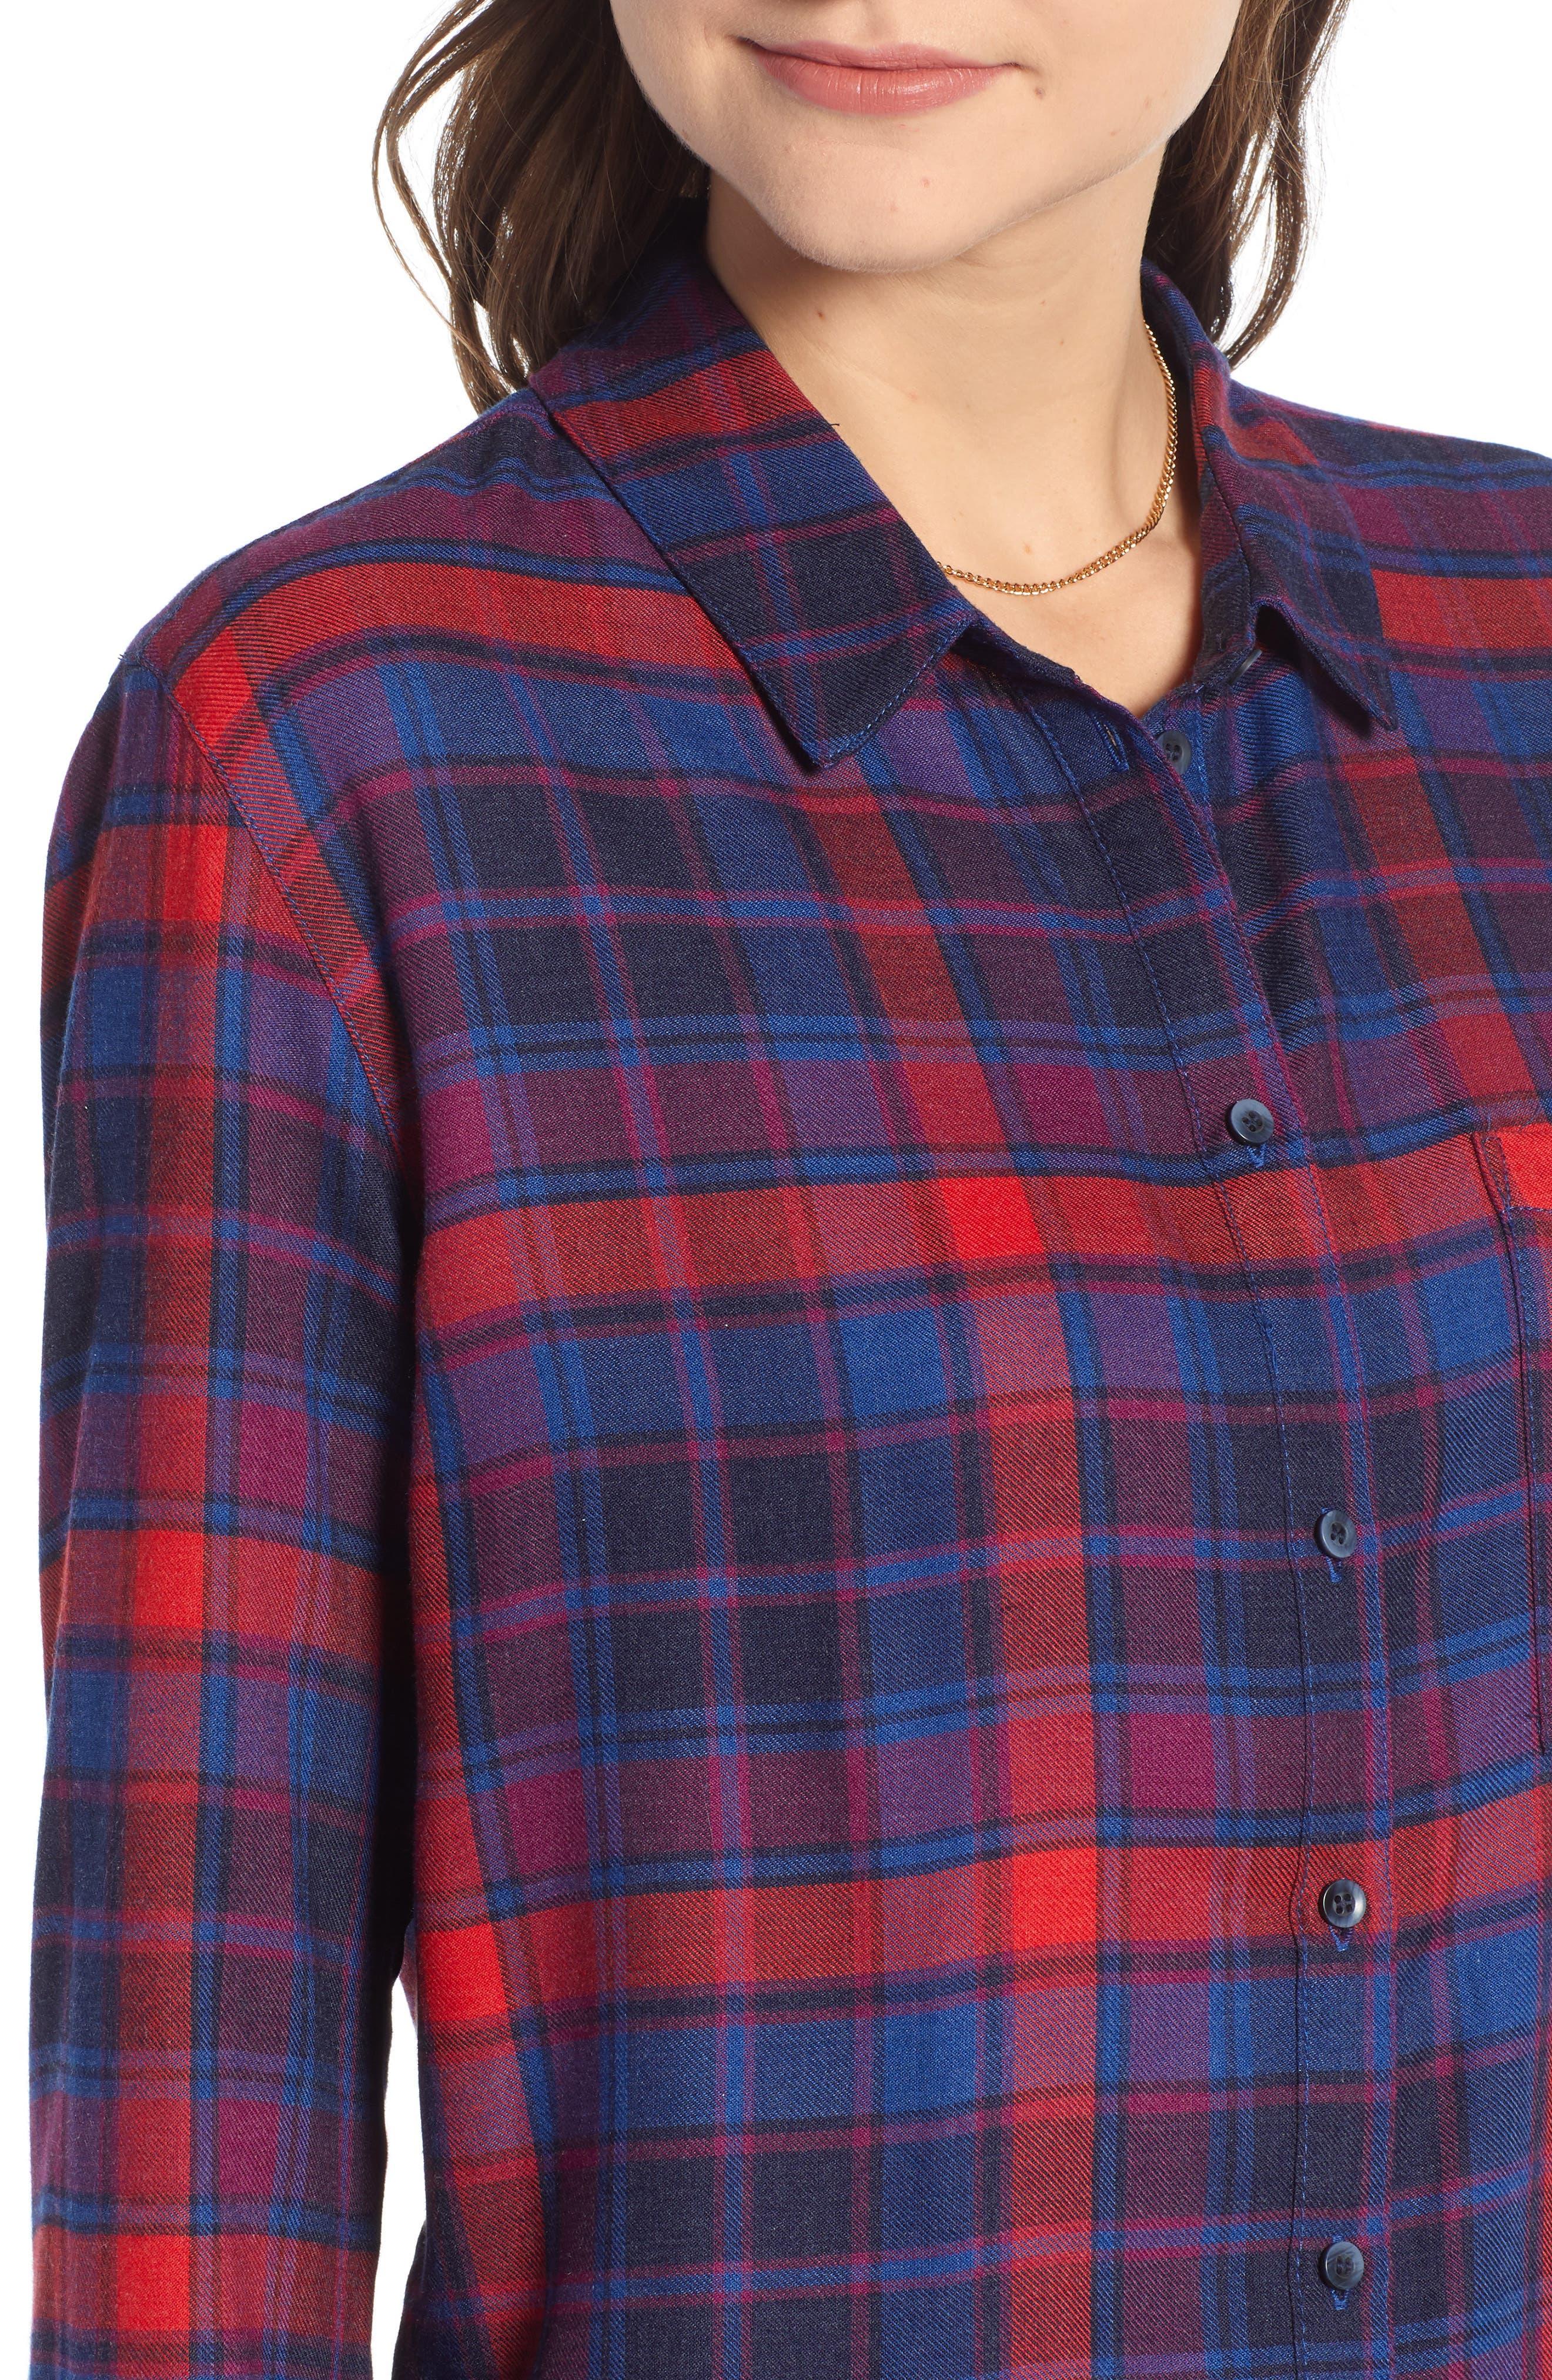 Plaid Boyfriend Shirt,                             Alternate thumbnail 4, color,                             BLUE SODALIGHT BEAMING PLAID